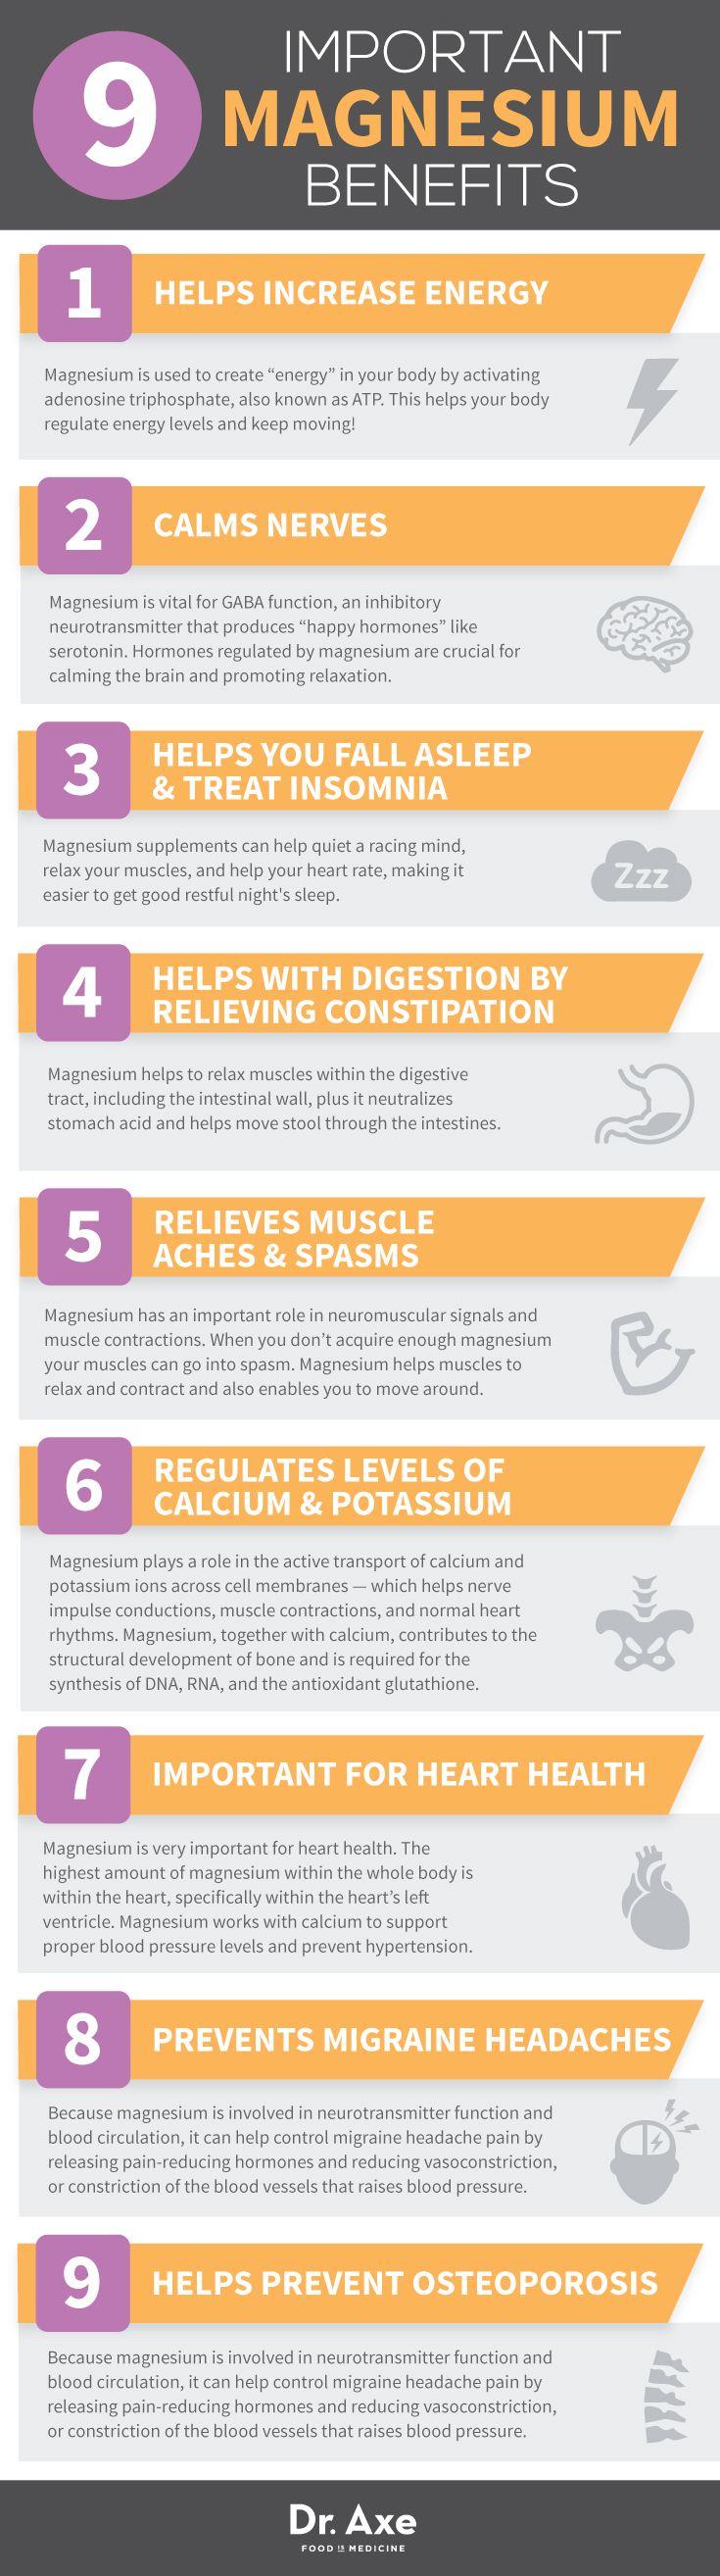 Magnesium Benefits http://www.draxe.com #health #holistic #natural